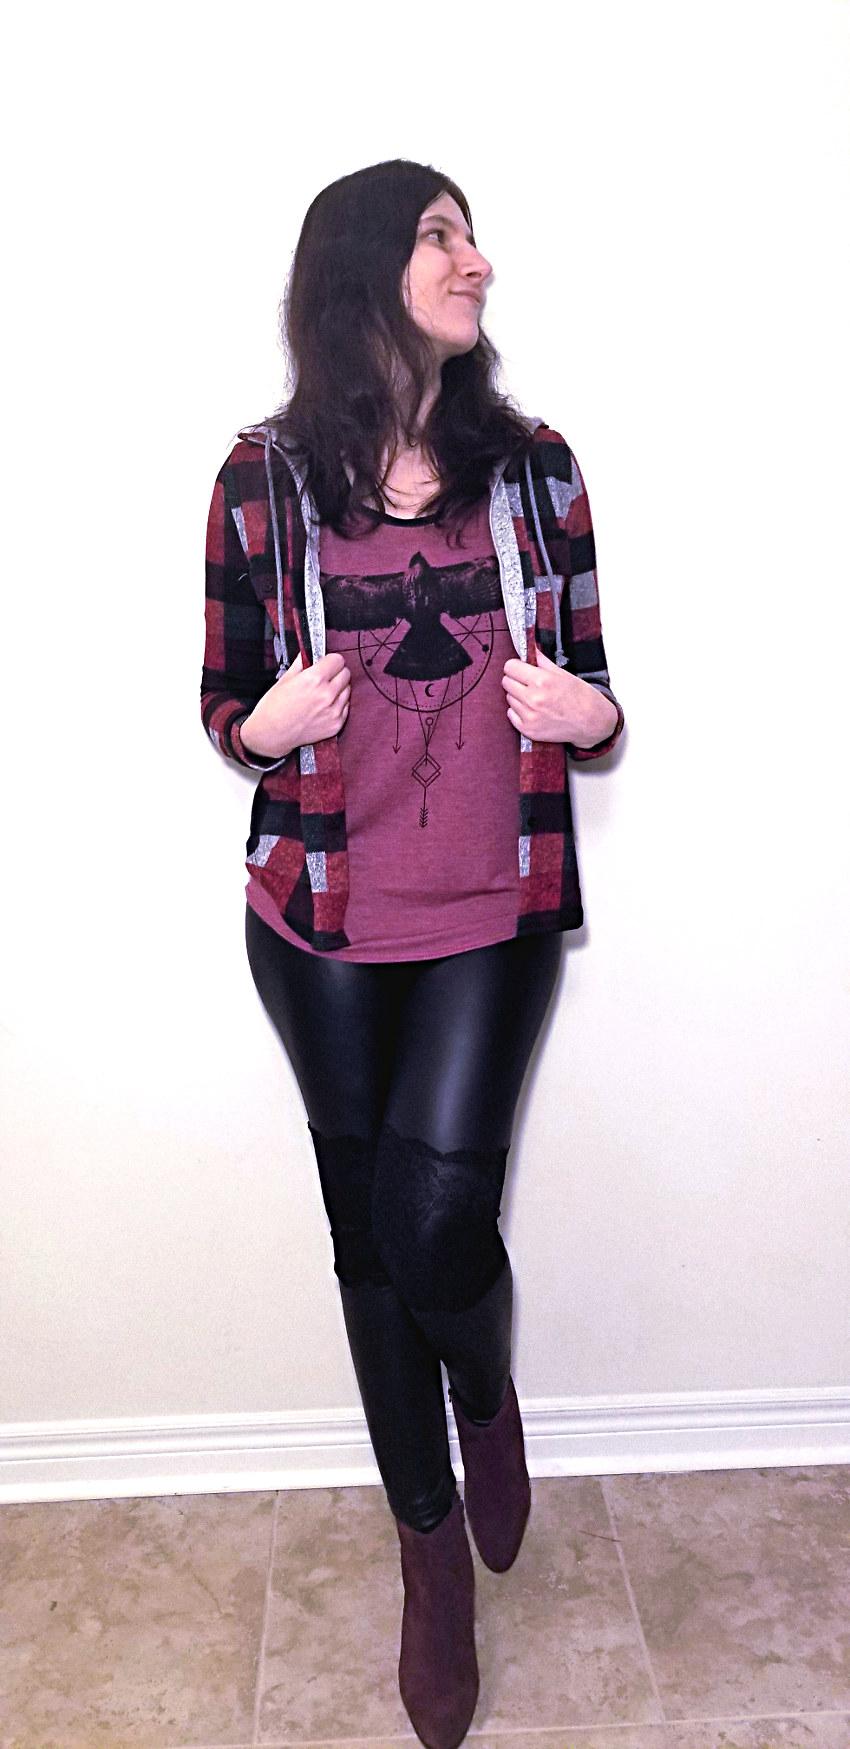 Polar Bear Style Hooded Plaid Shirt Black Leather Leggings Burgundy T-Shirt Burgundy Ankle Boots